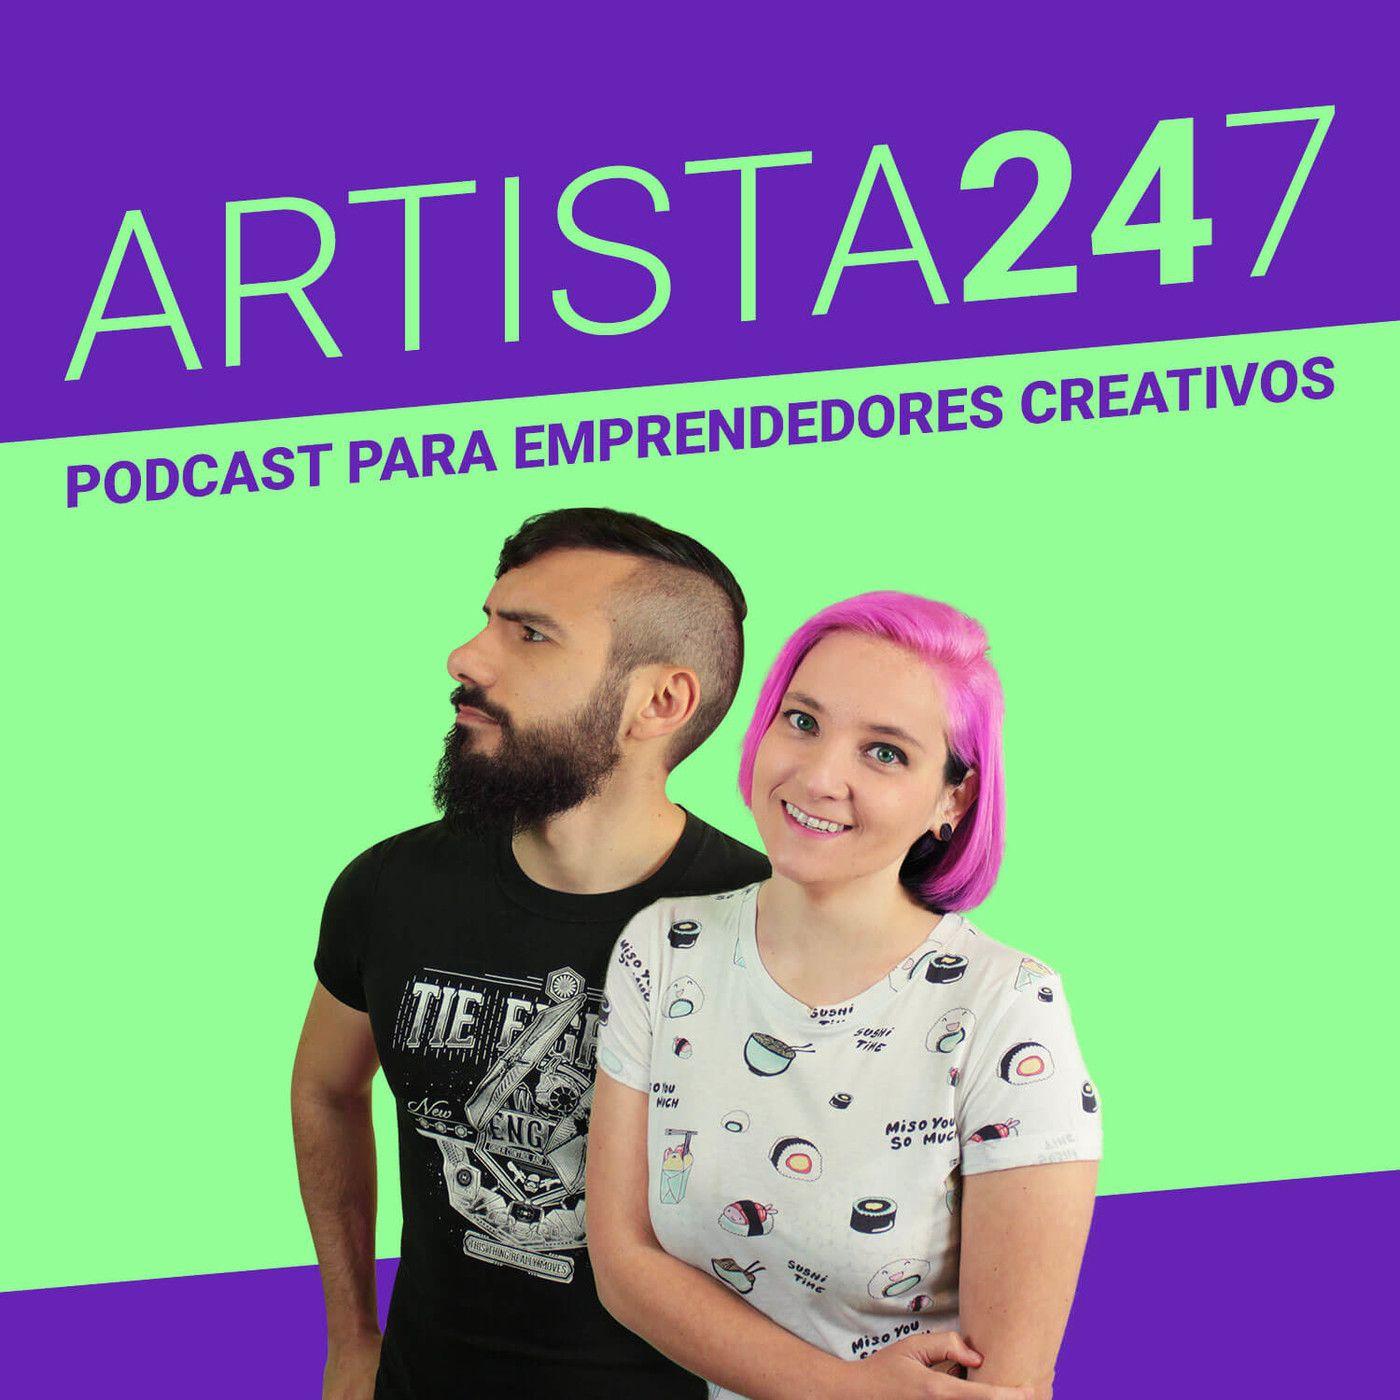 artista 24-7